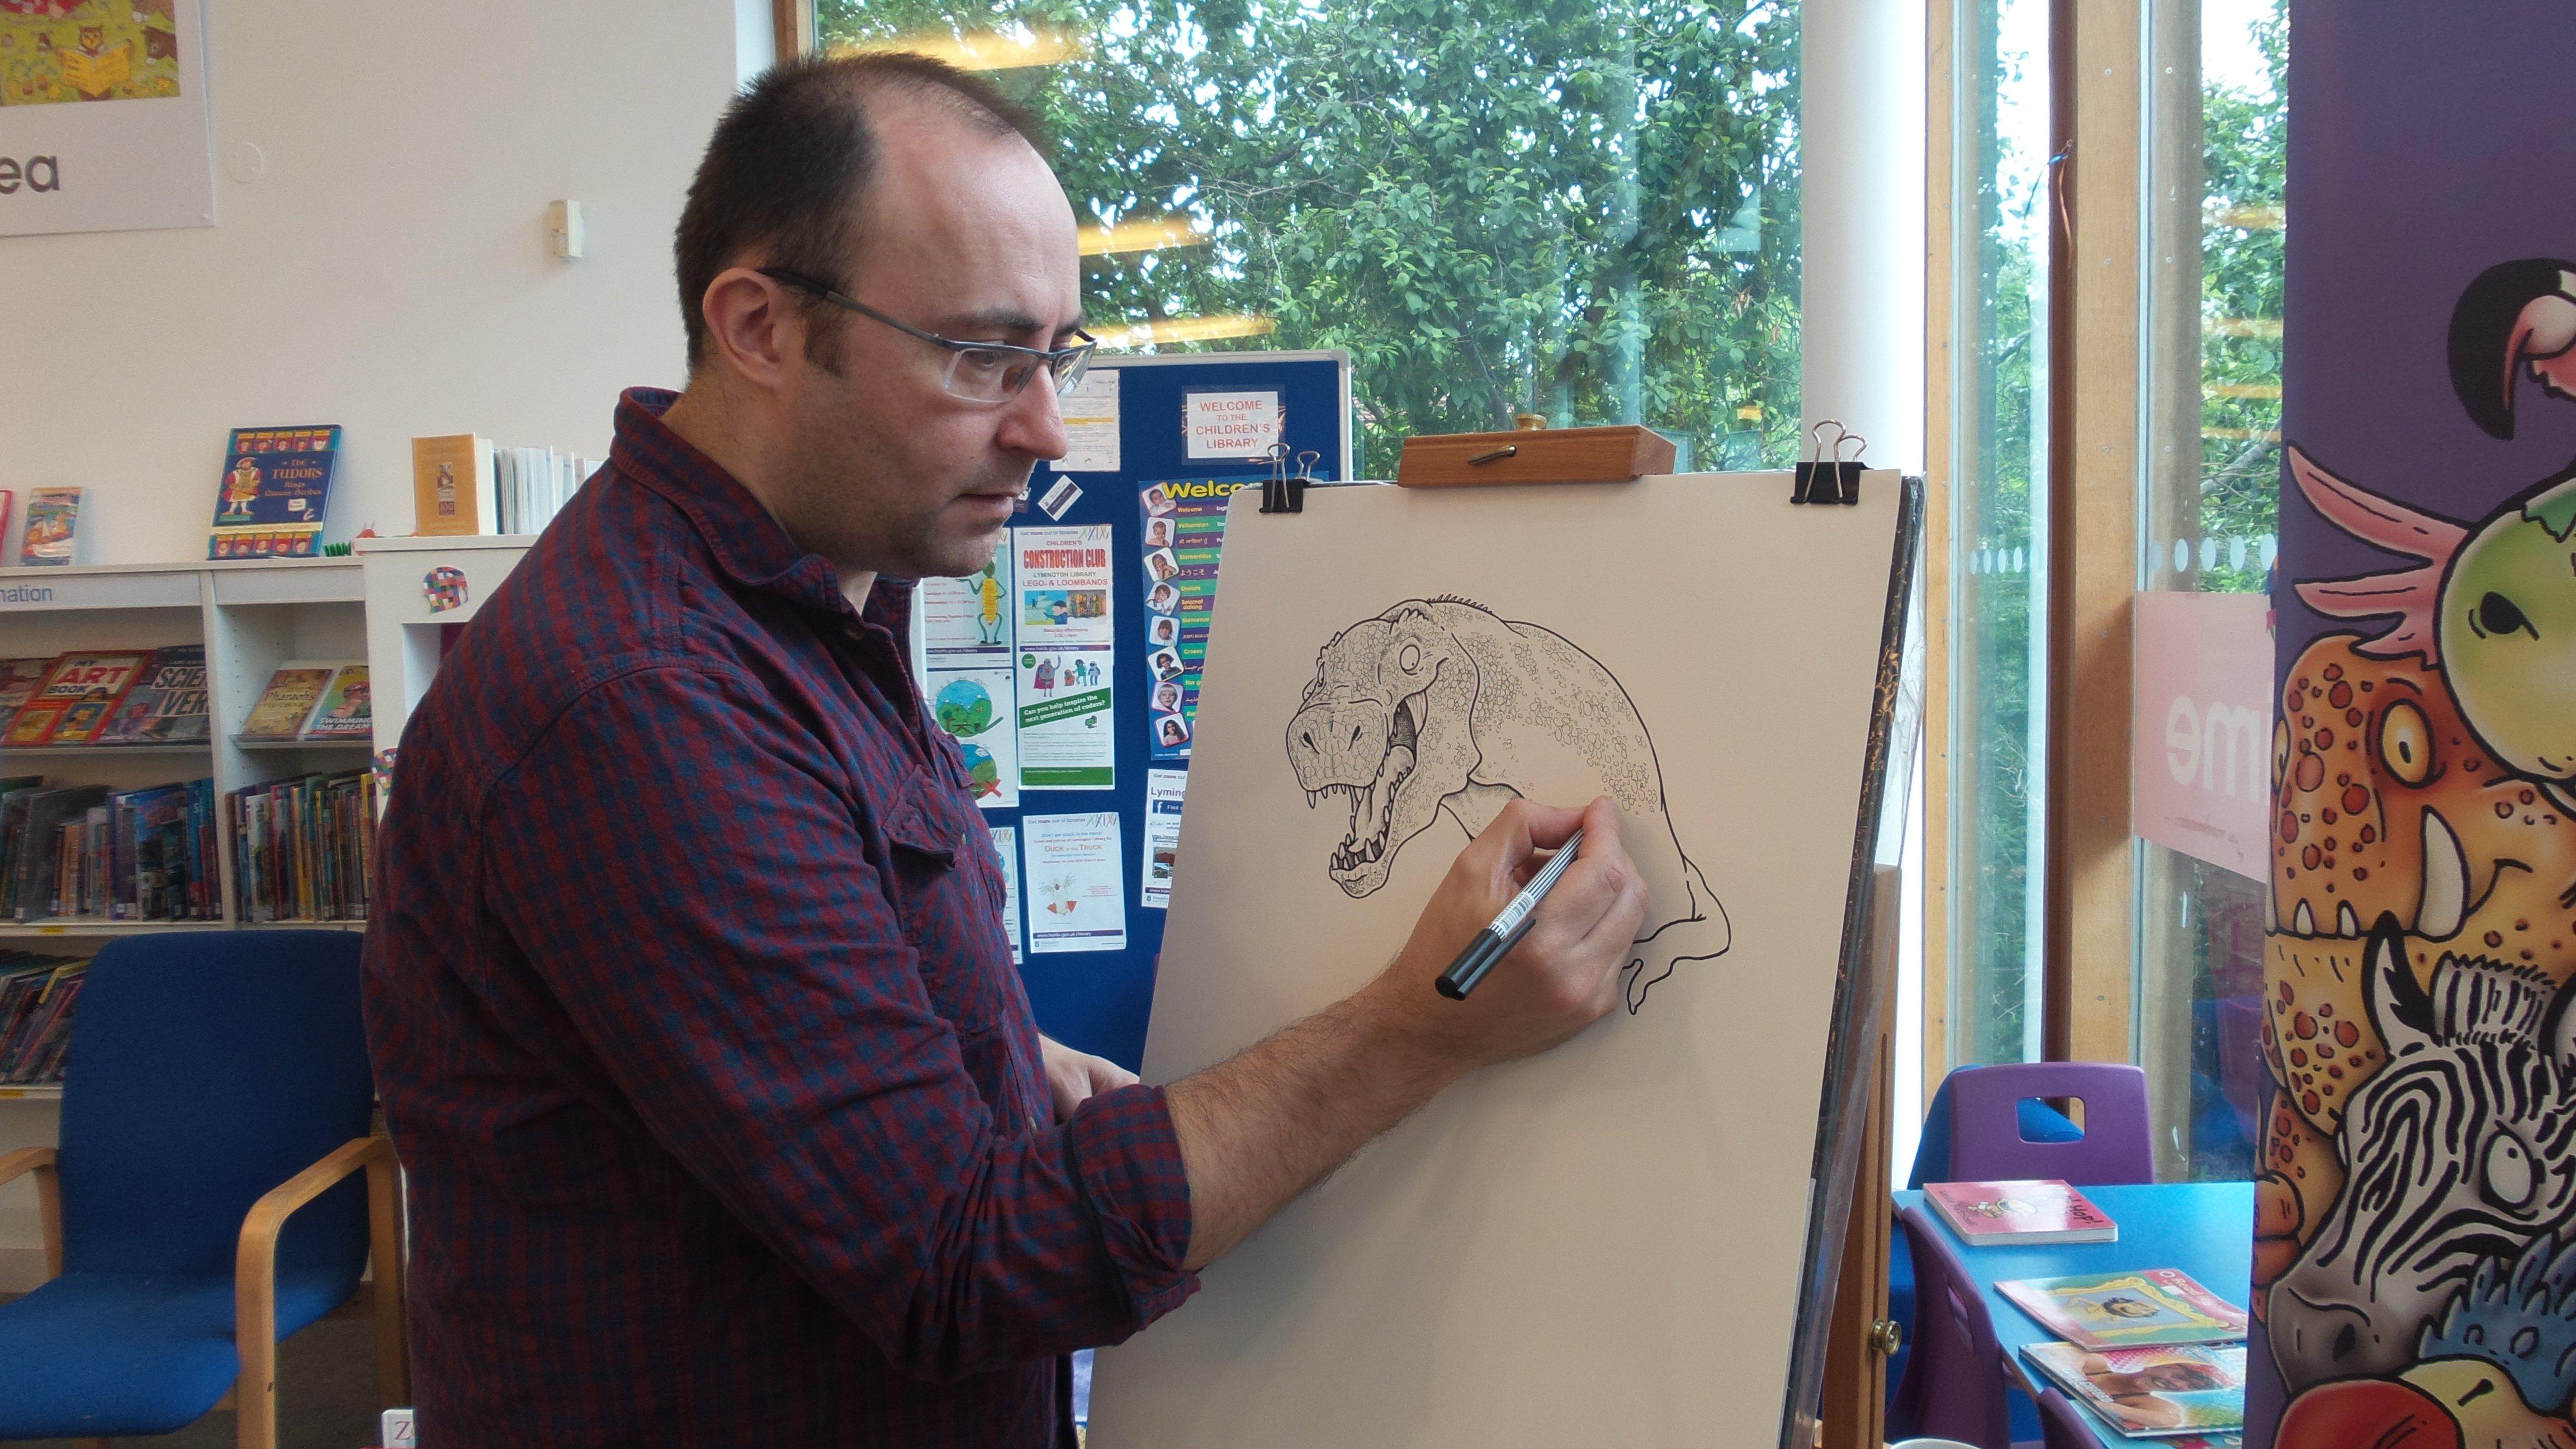 Simon Chadwick drawing at Lymington Library on Saturday 11 June